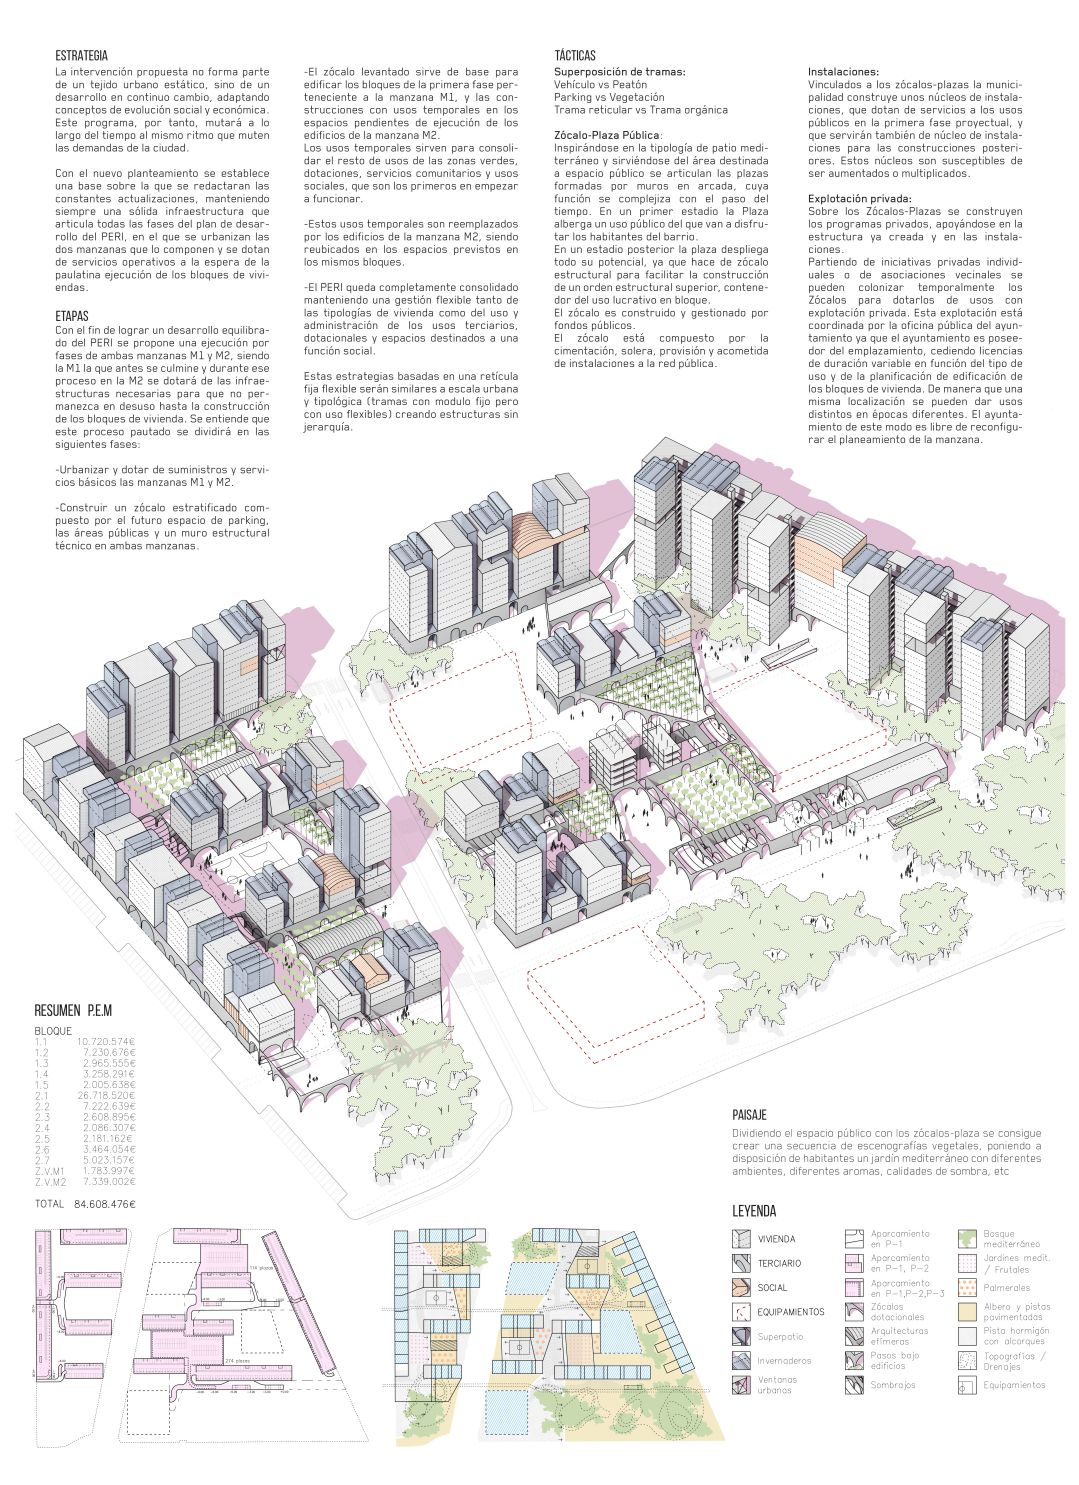 Desarrollo masterplan urbano en Malaga. Manzana verde.